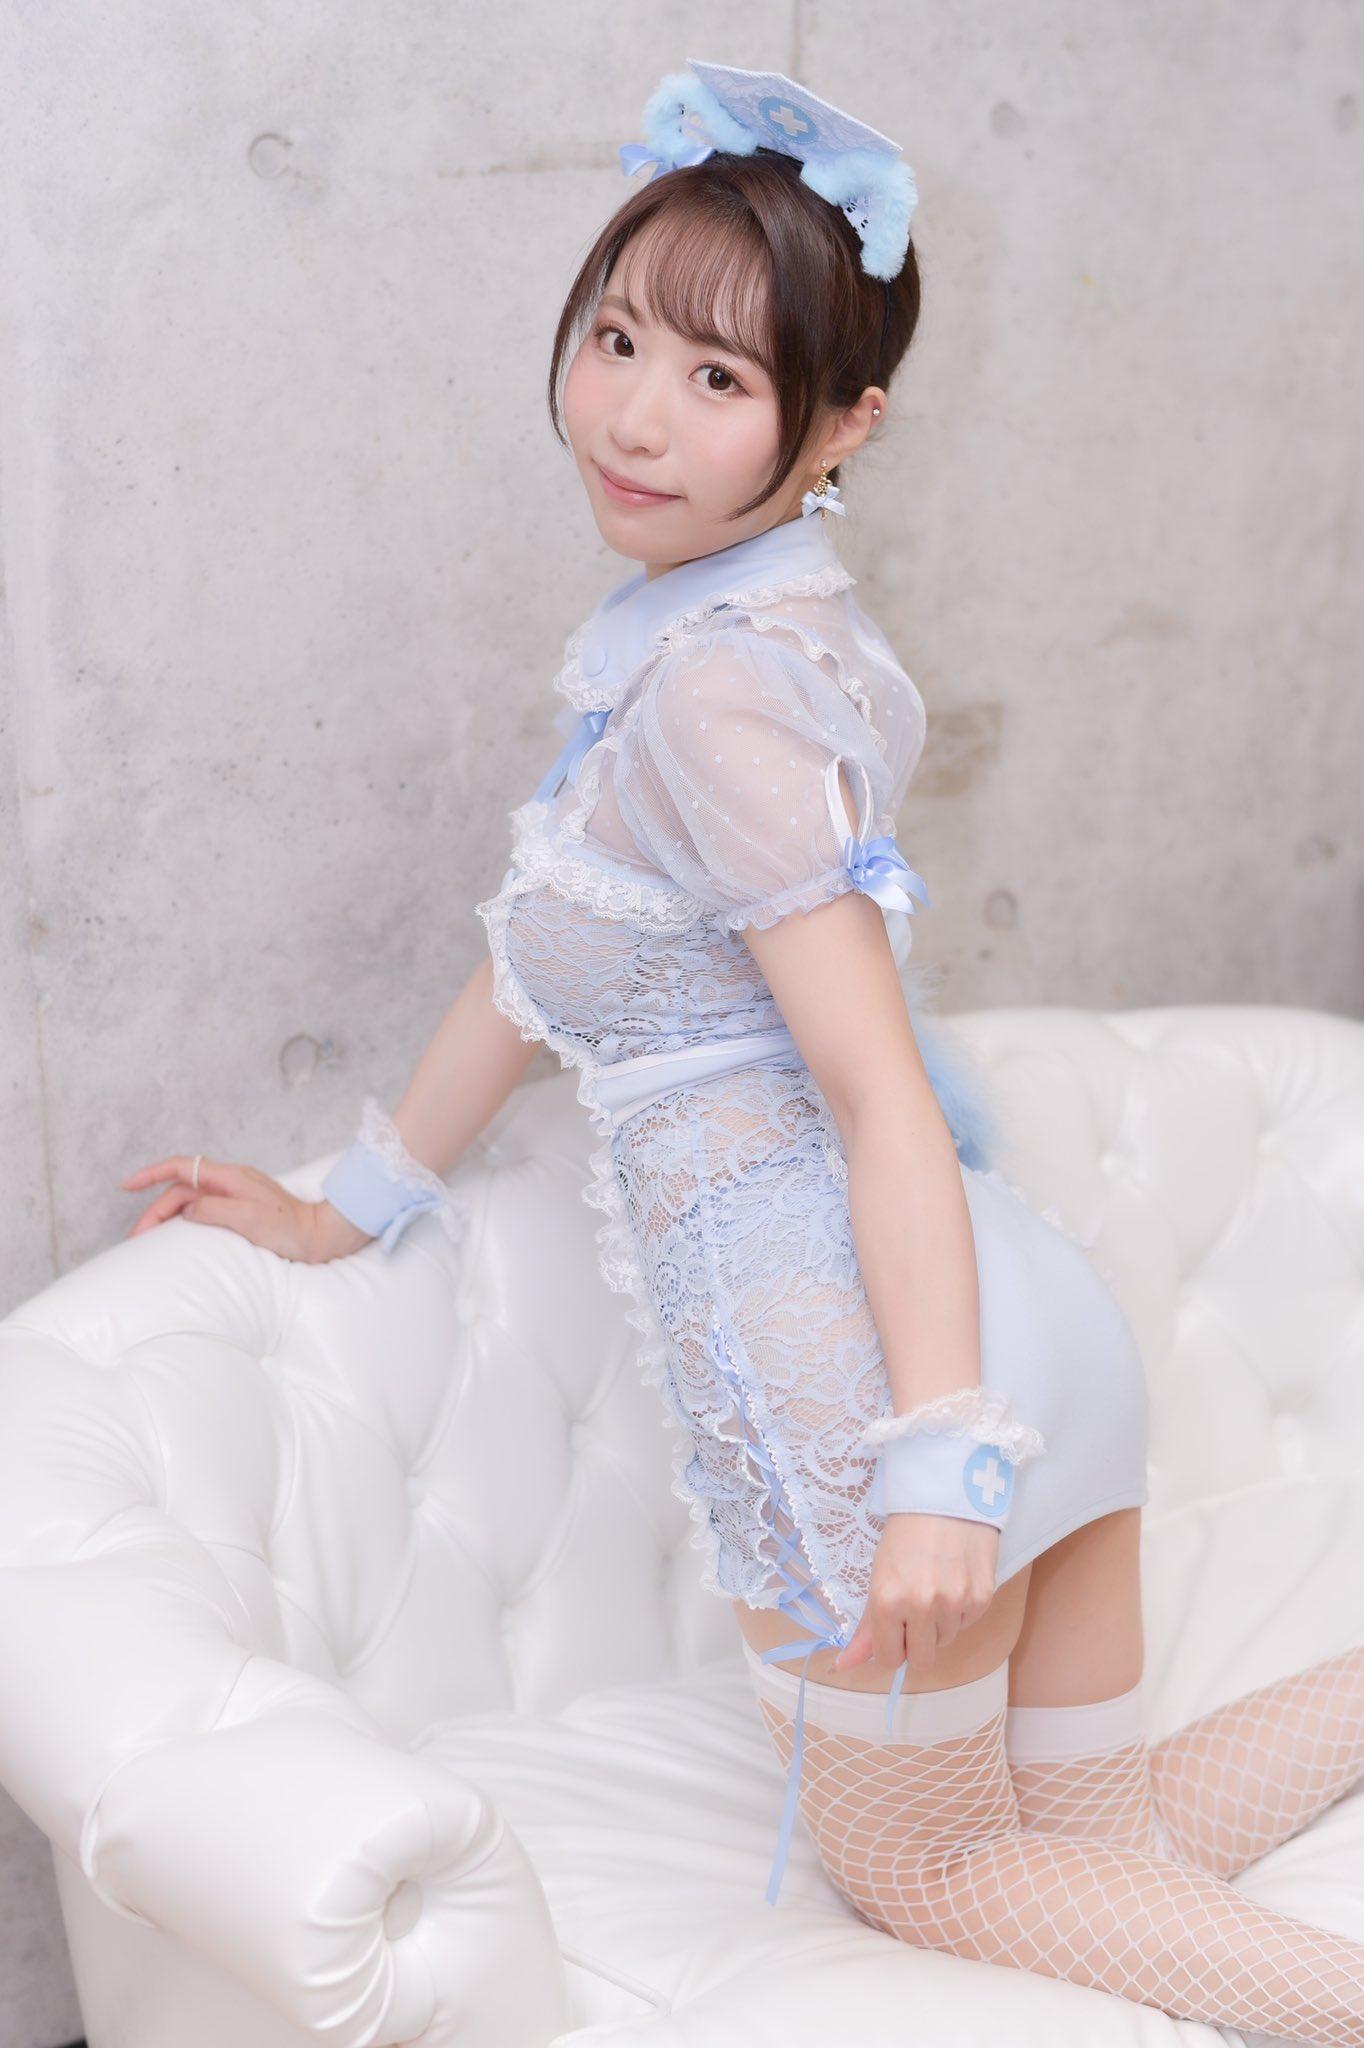 rogufuku-1429777752647823365-20210823_200914-img4.jpg